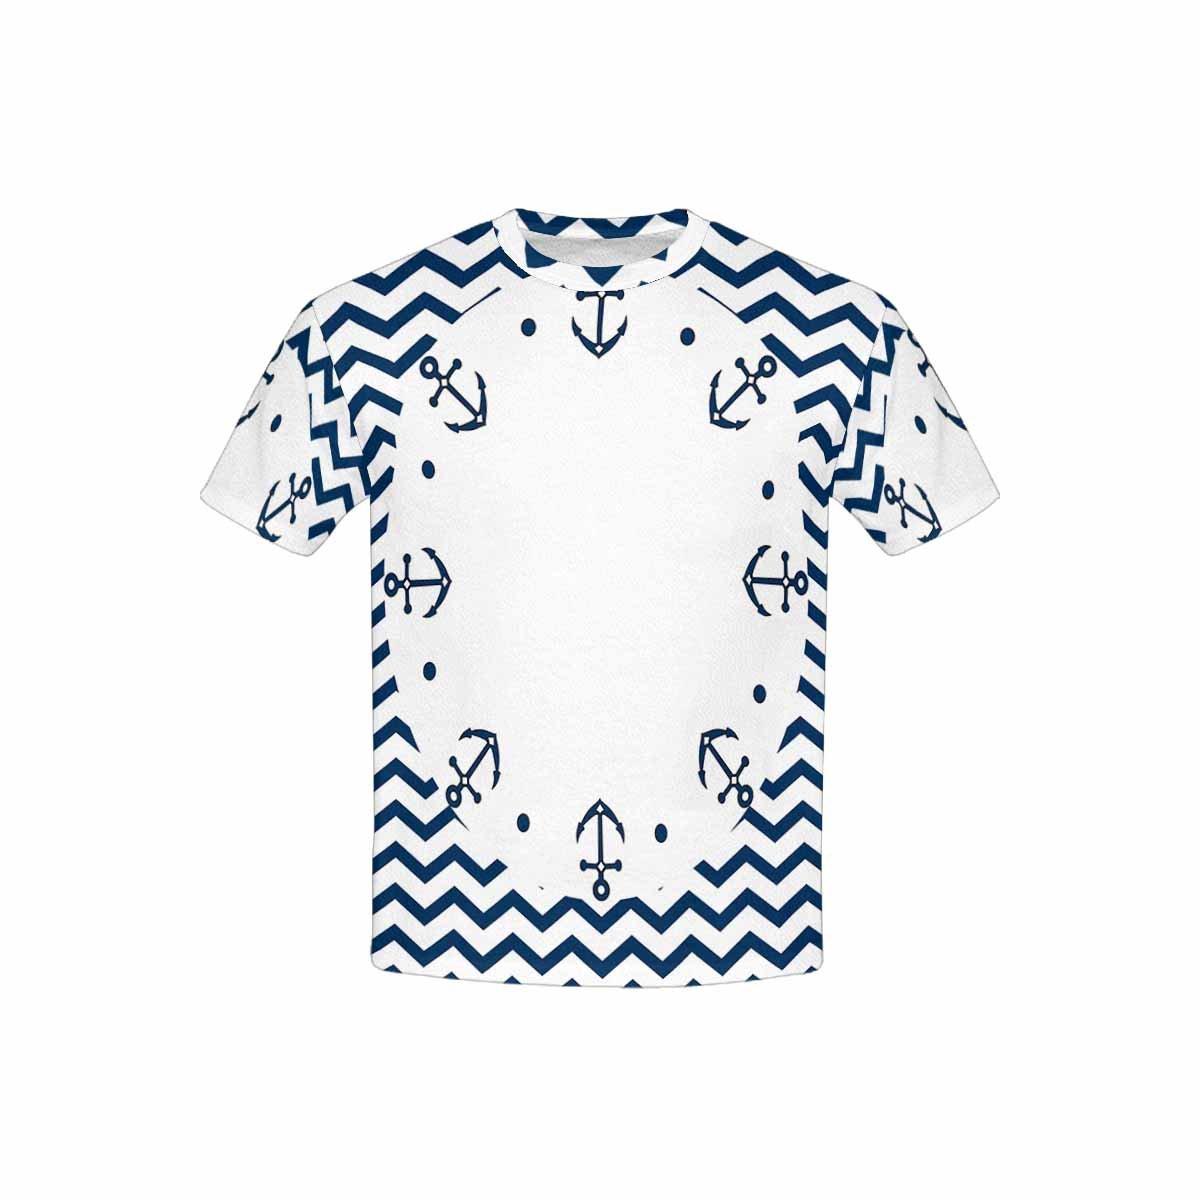 XS-XL INTERESTPRINT Round Navy Anchors and Dots Youth T-Shirts